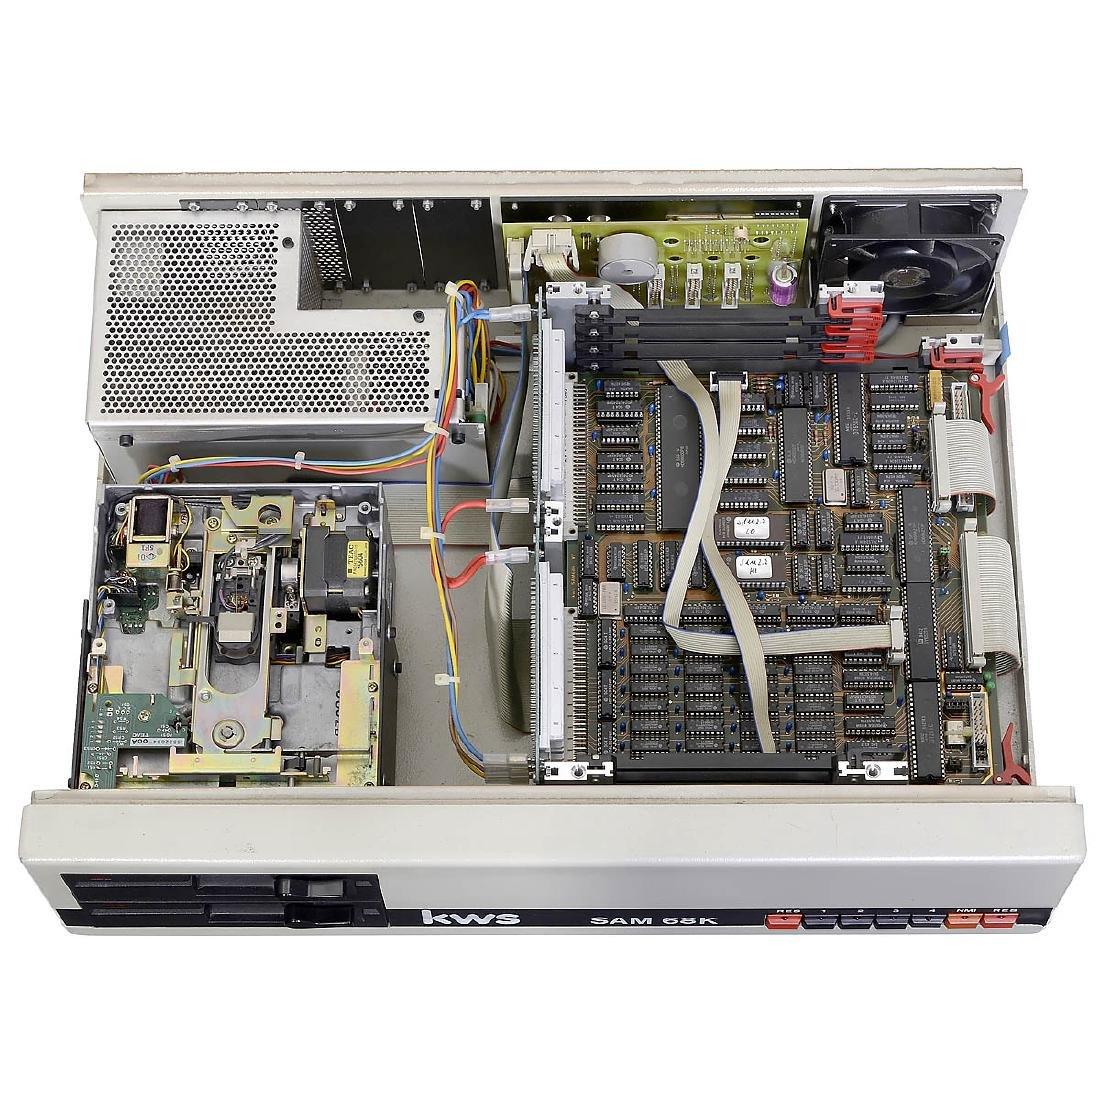 KWS SAM 68K Computer, 1983 - 2